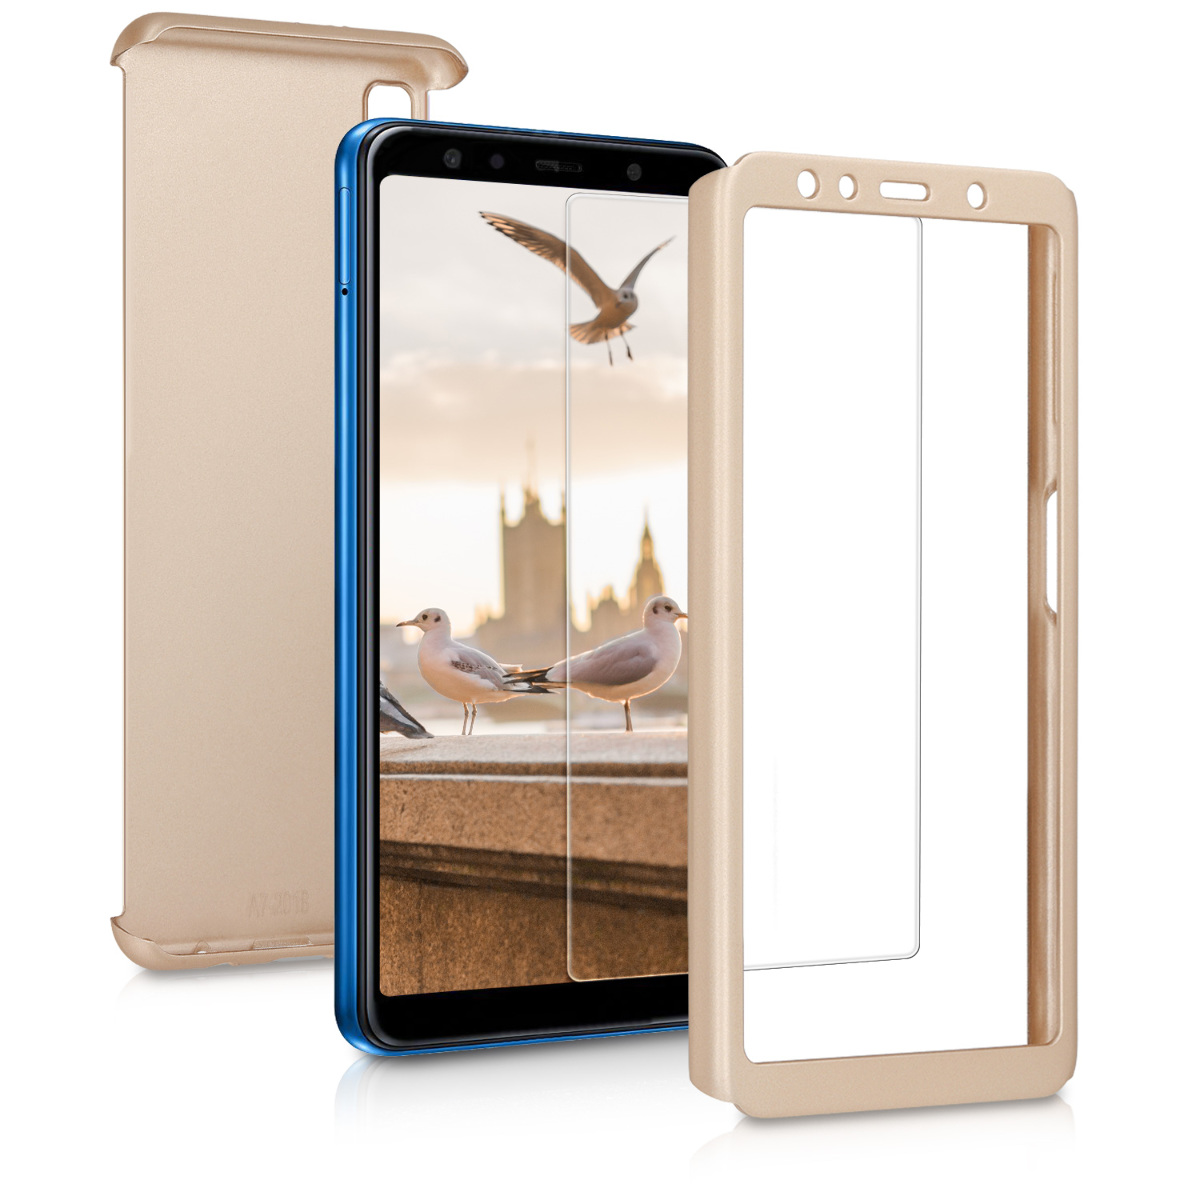 KW Θήκη Full Body with screen protector- Samsung Galaxy A7 (2018) - Metallic Gold (46423.66)